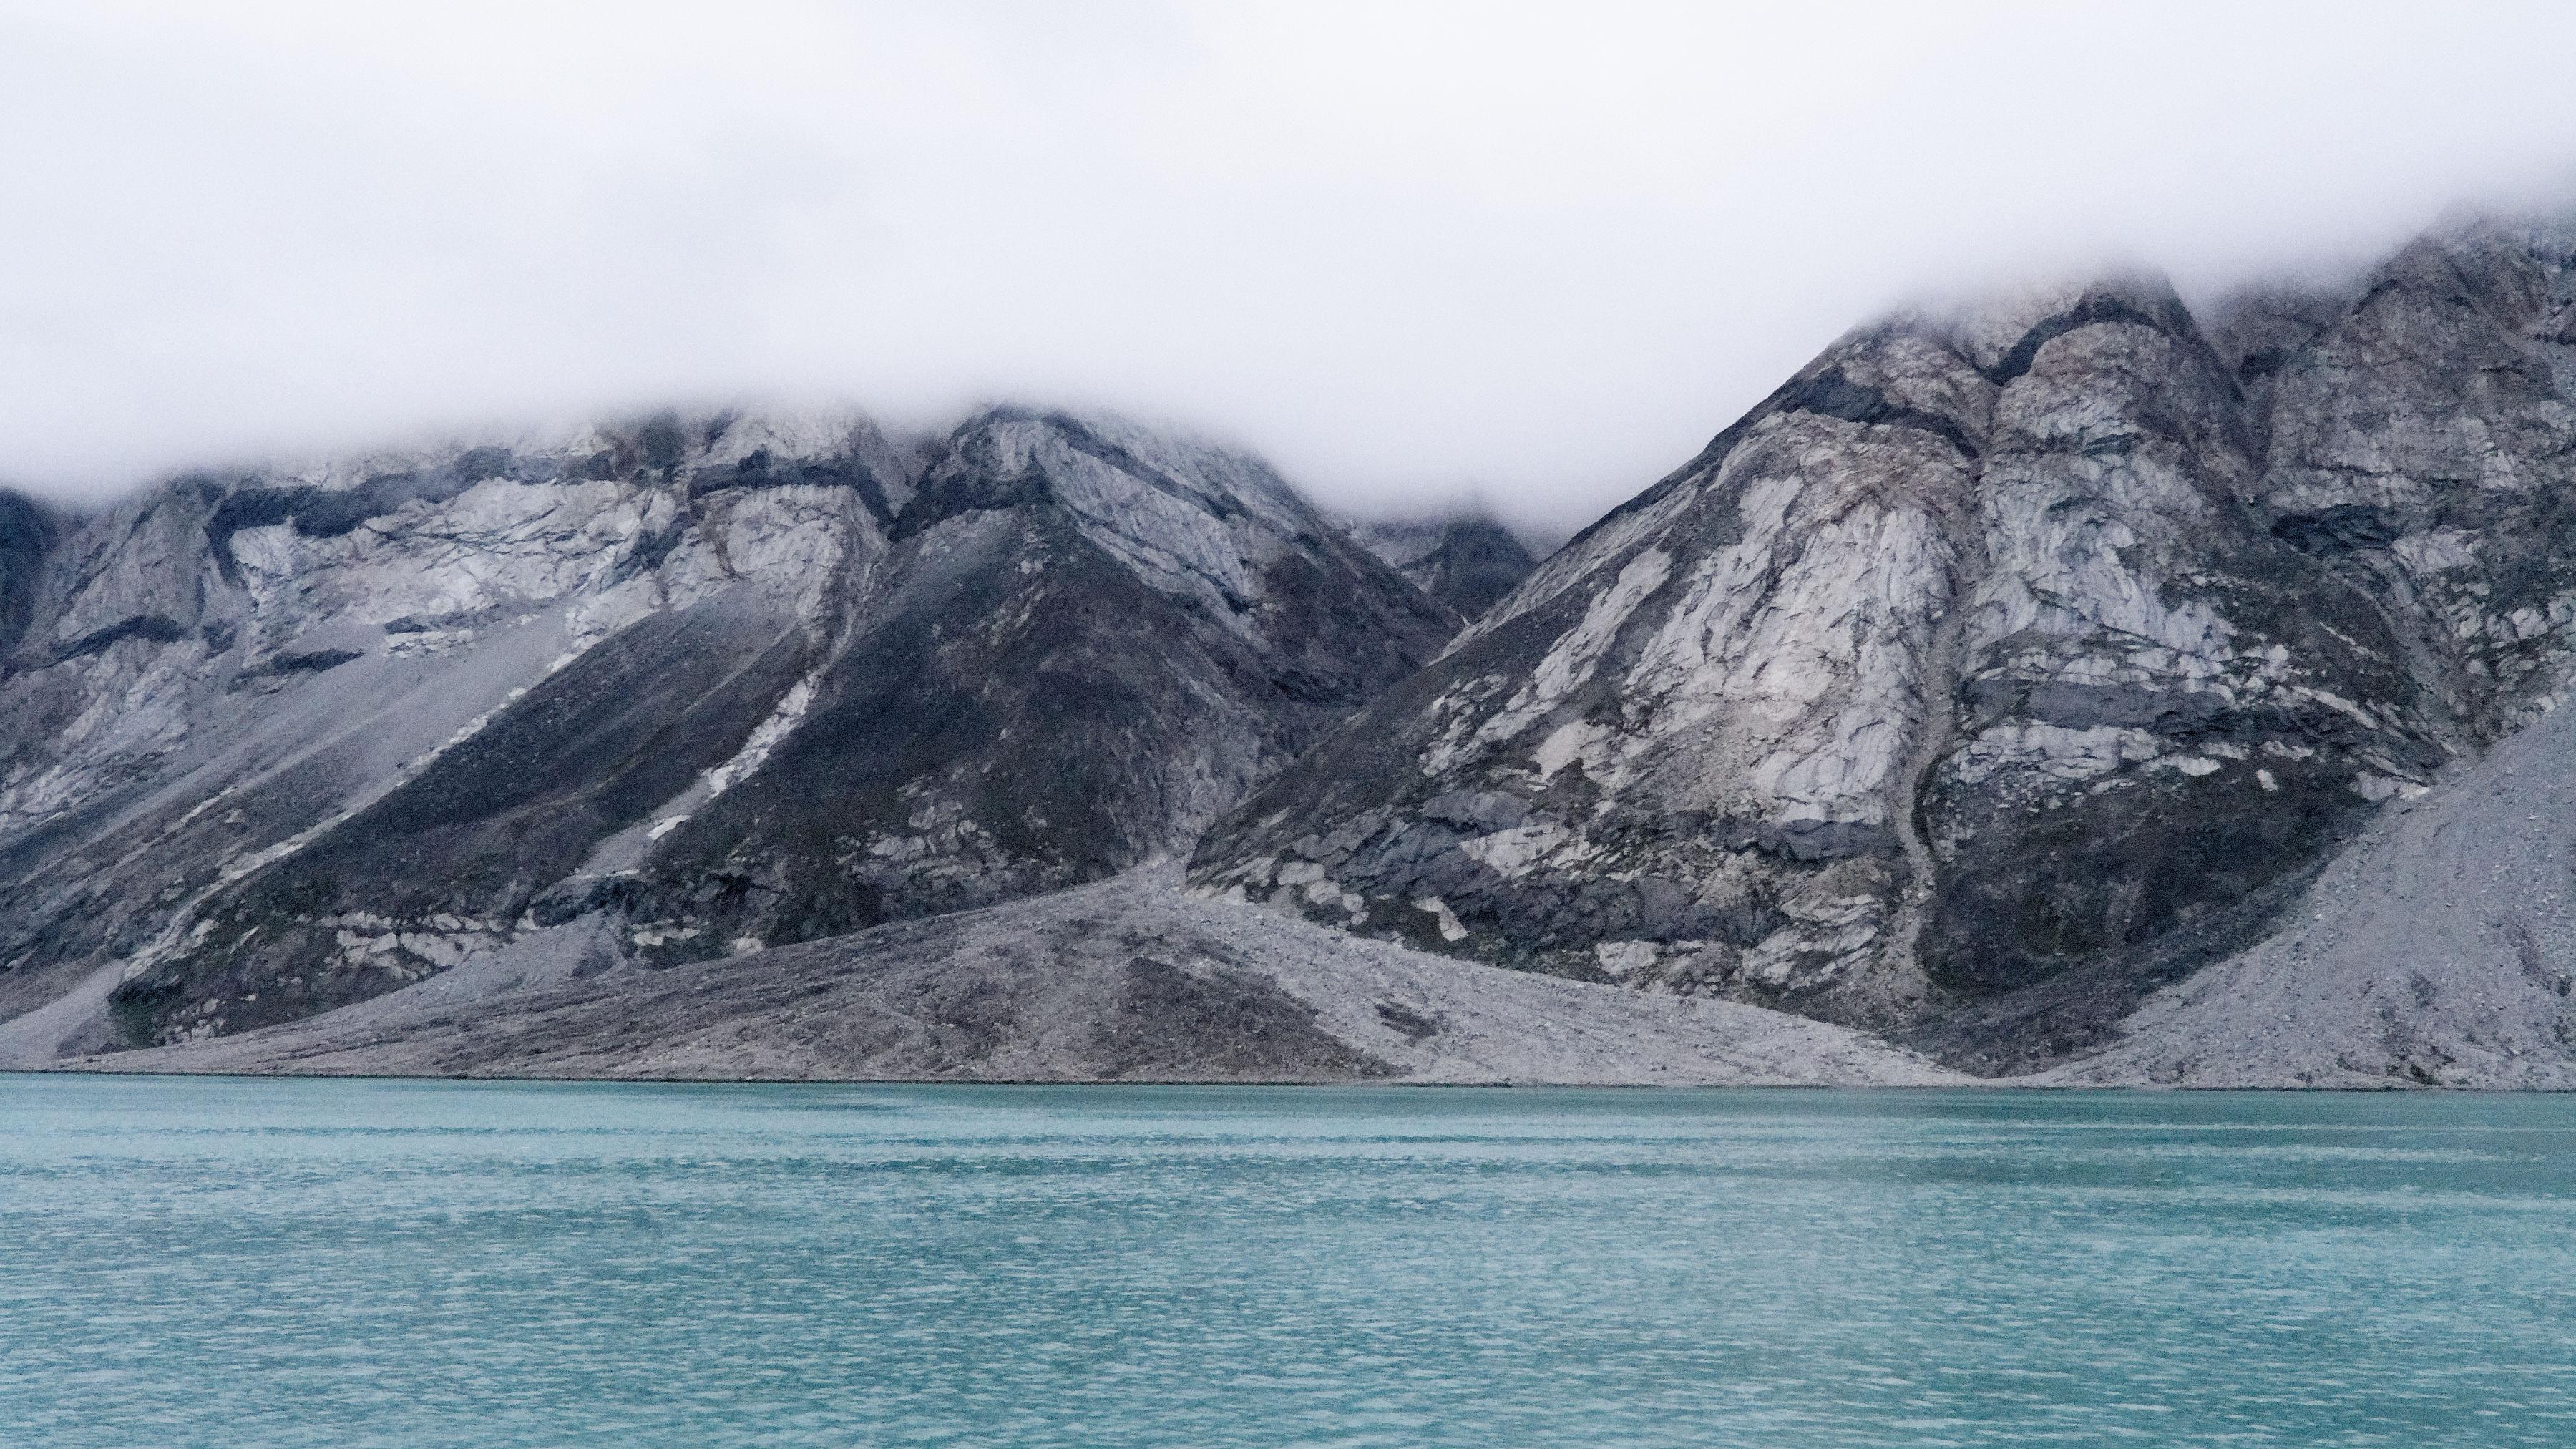 Le fjord de Kangerlussuaq